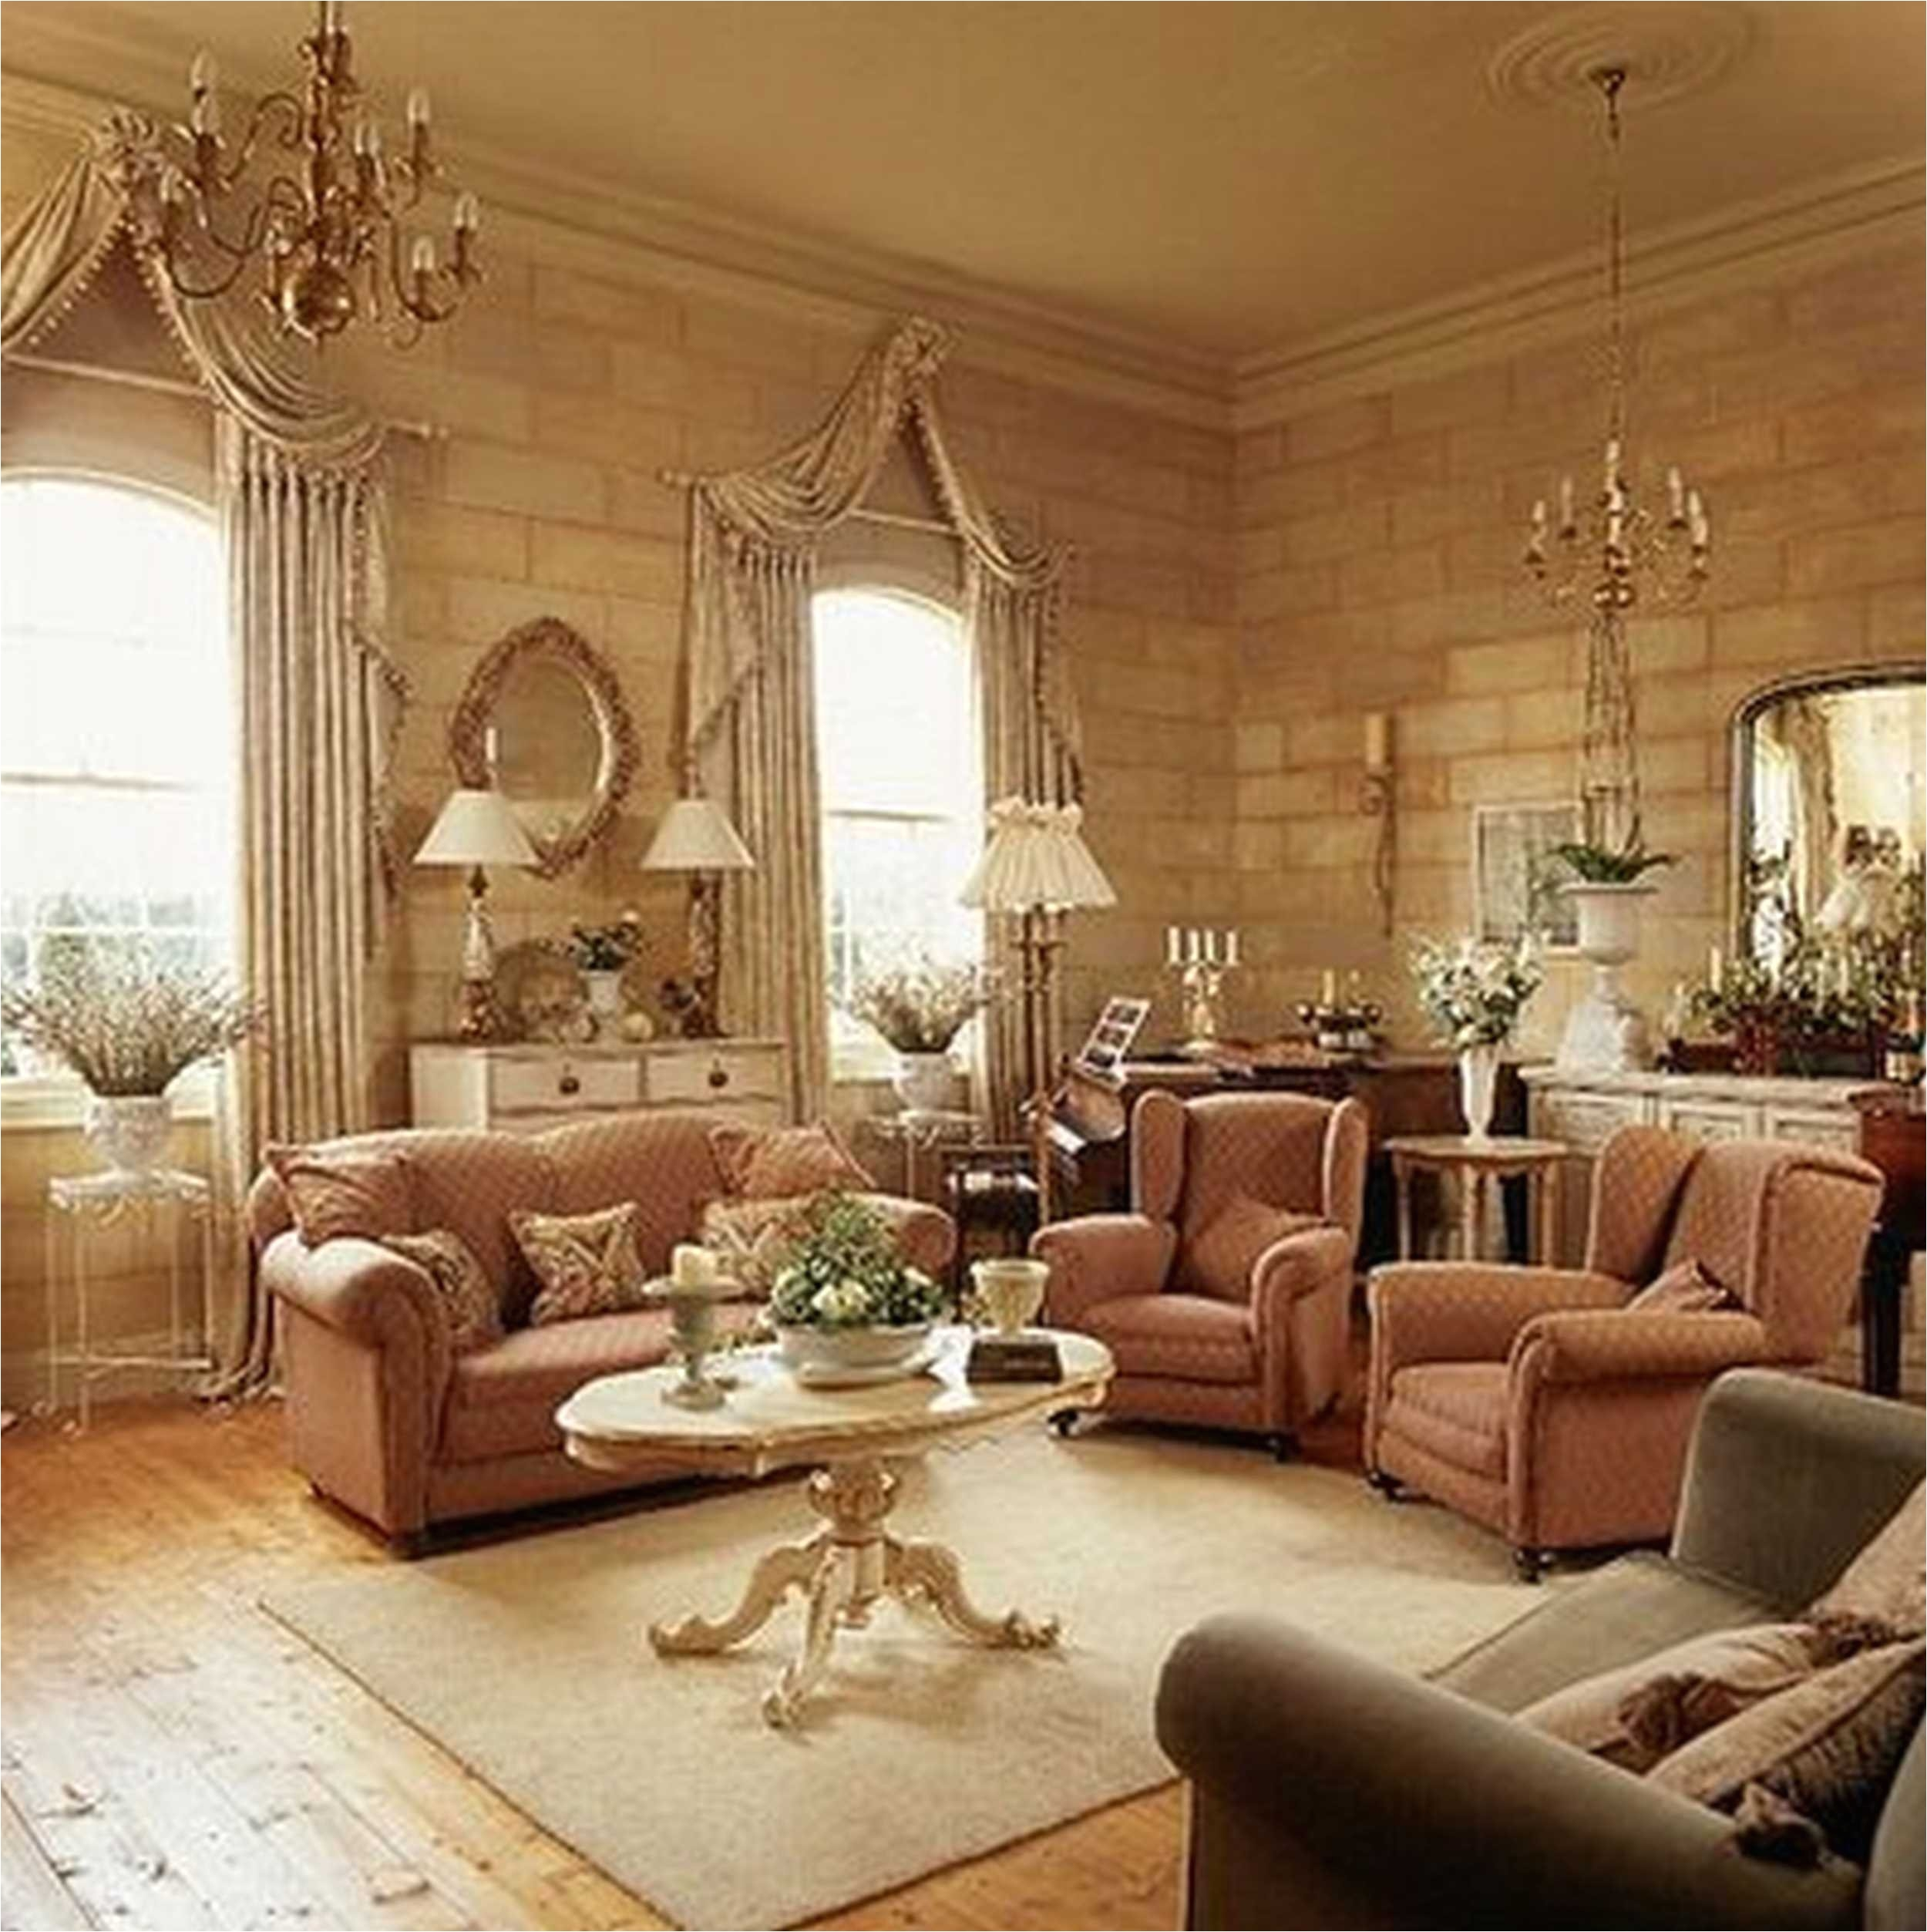 Living Room Decorating Ideas Modern Design Ideas for Living Room Save Living Room Traditional